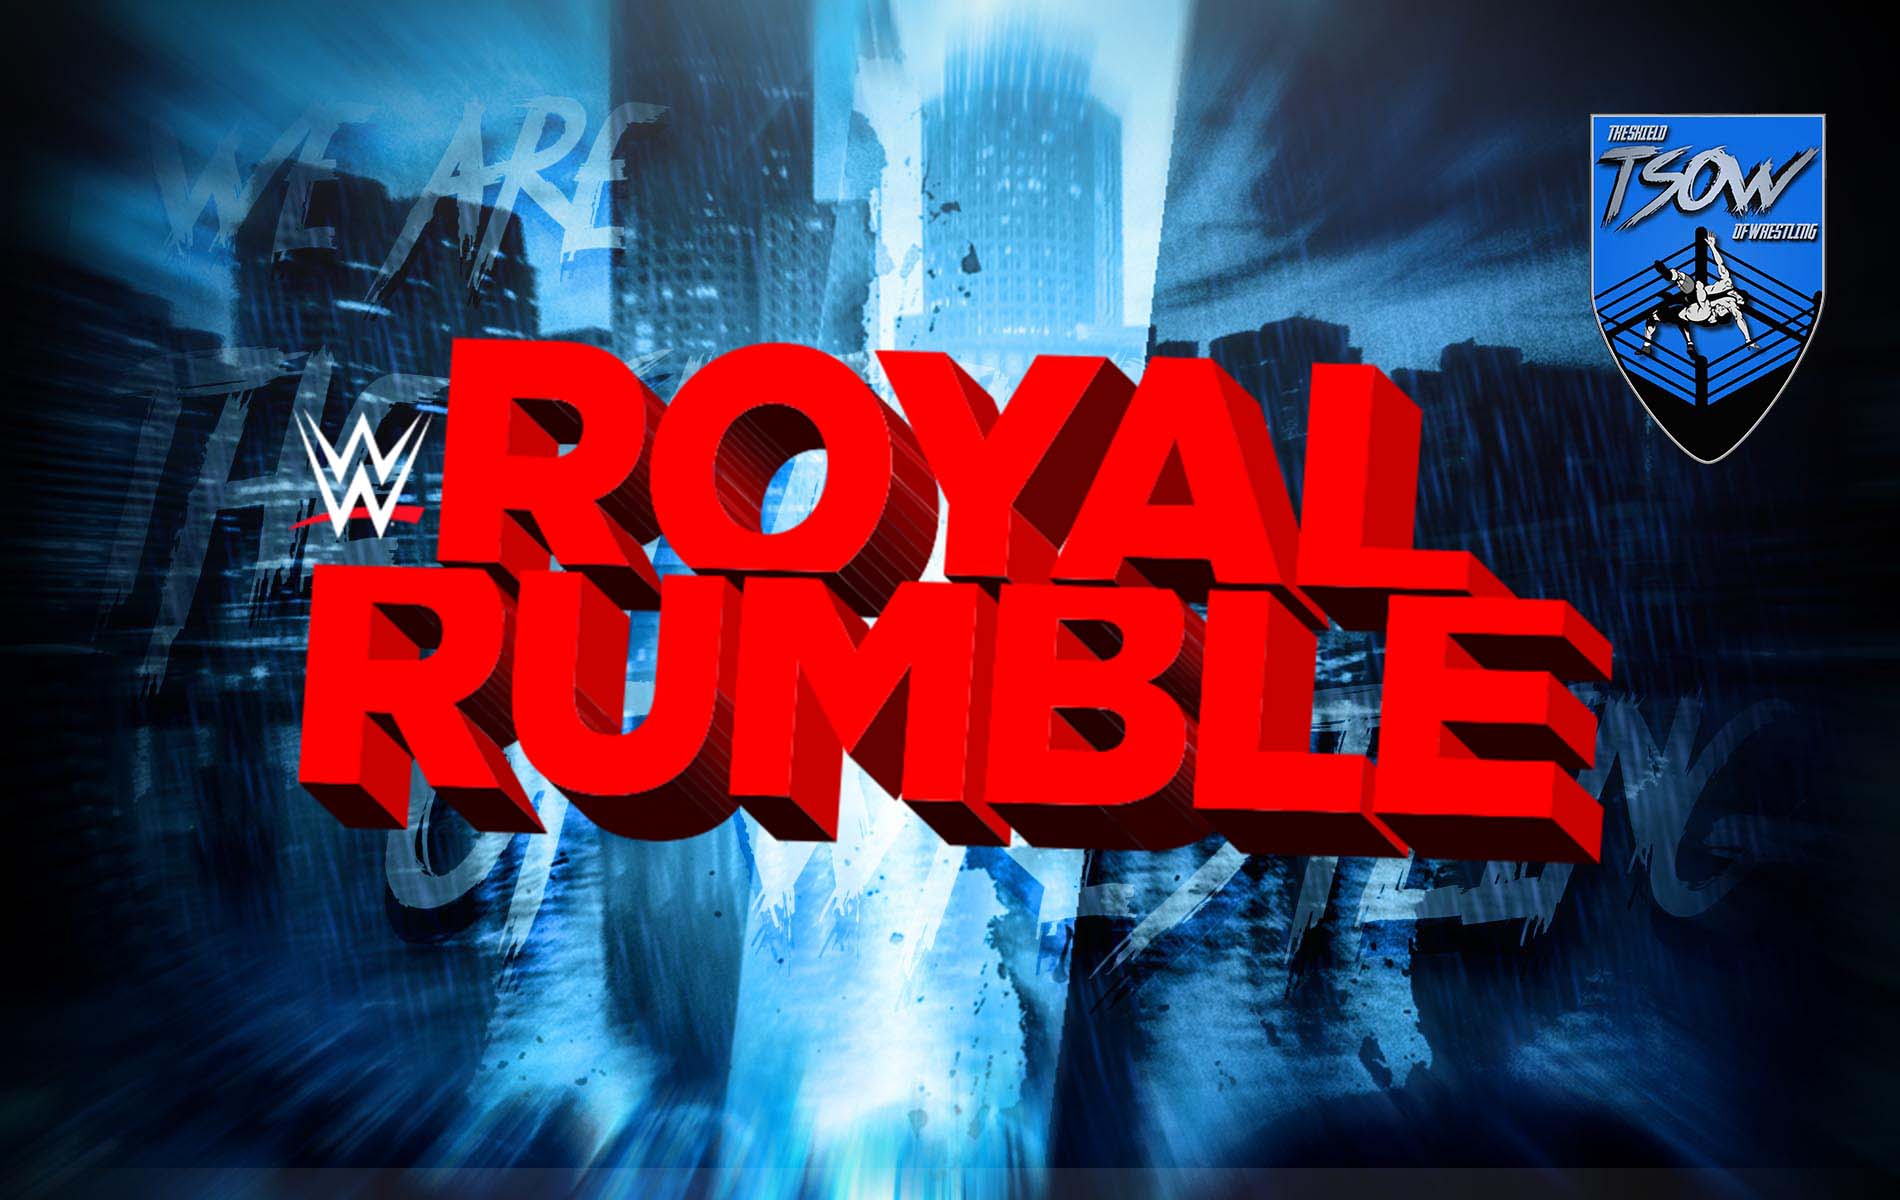 WWE Royal Rumble 2021 - Ritorni e sorprese del PPV